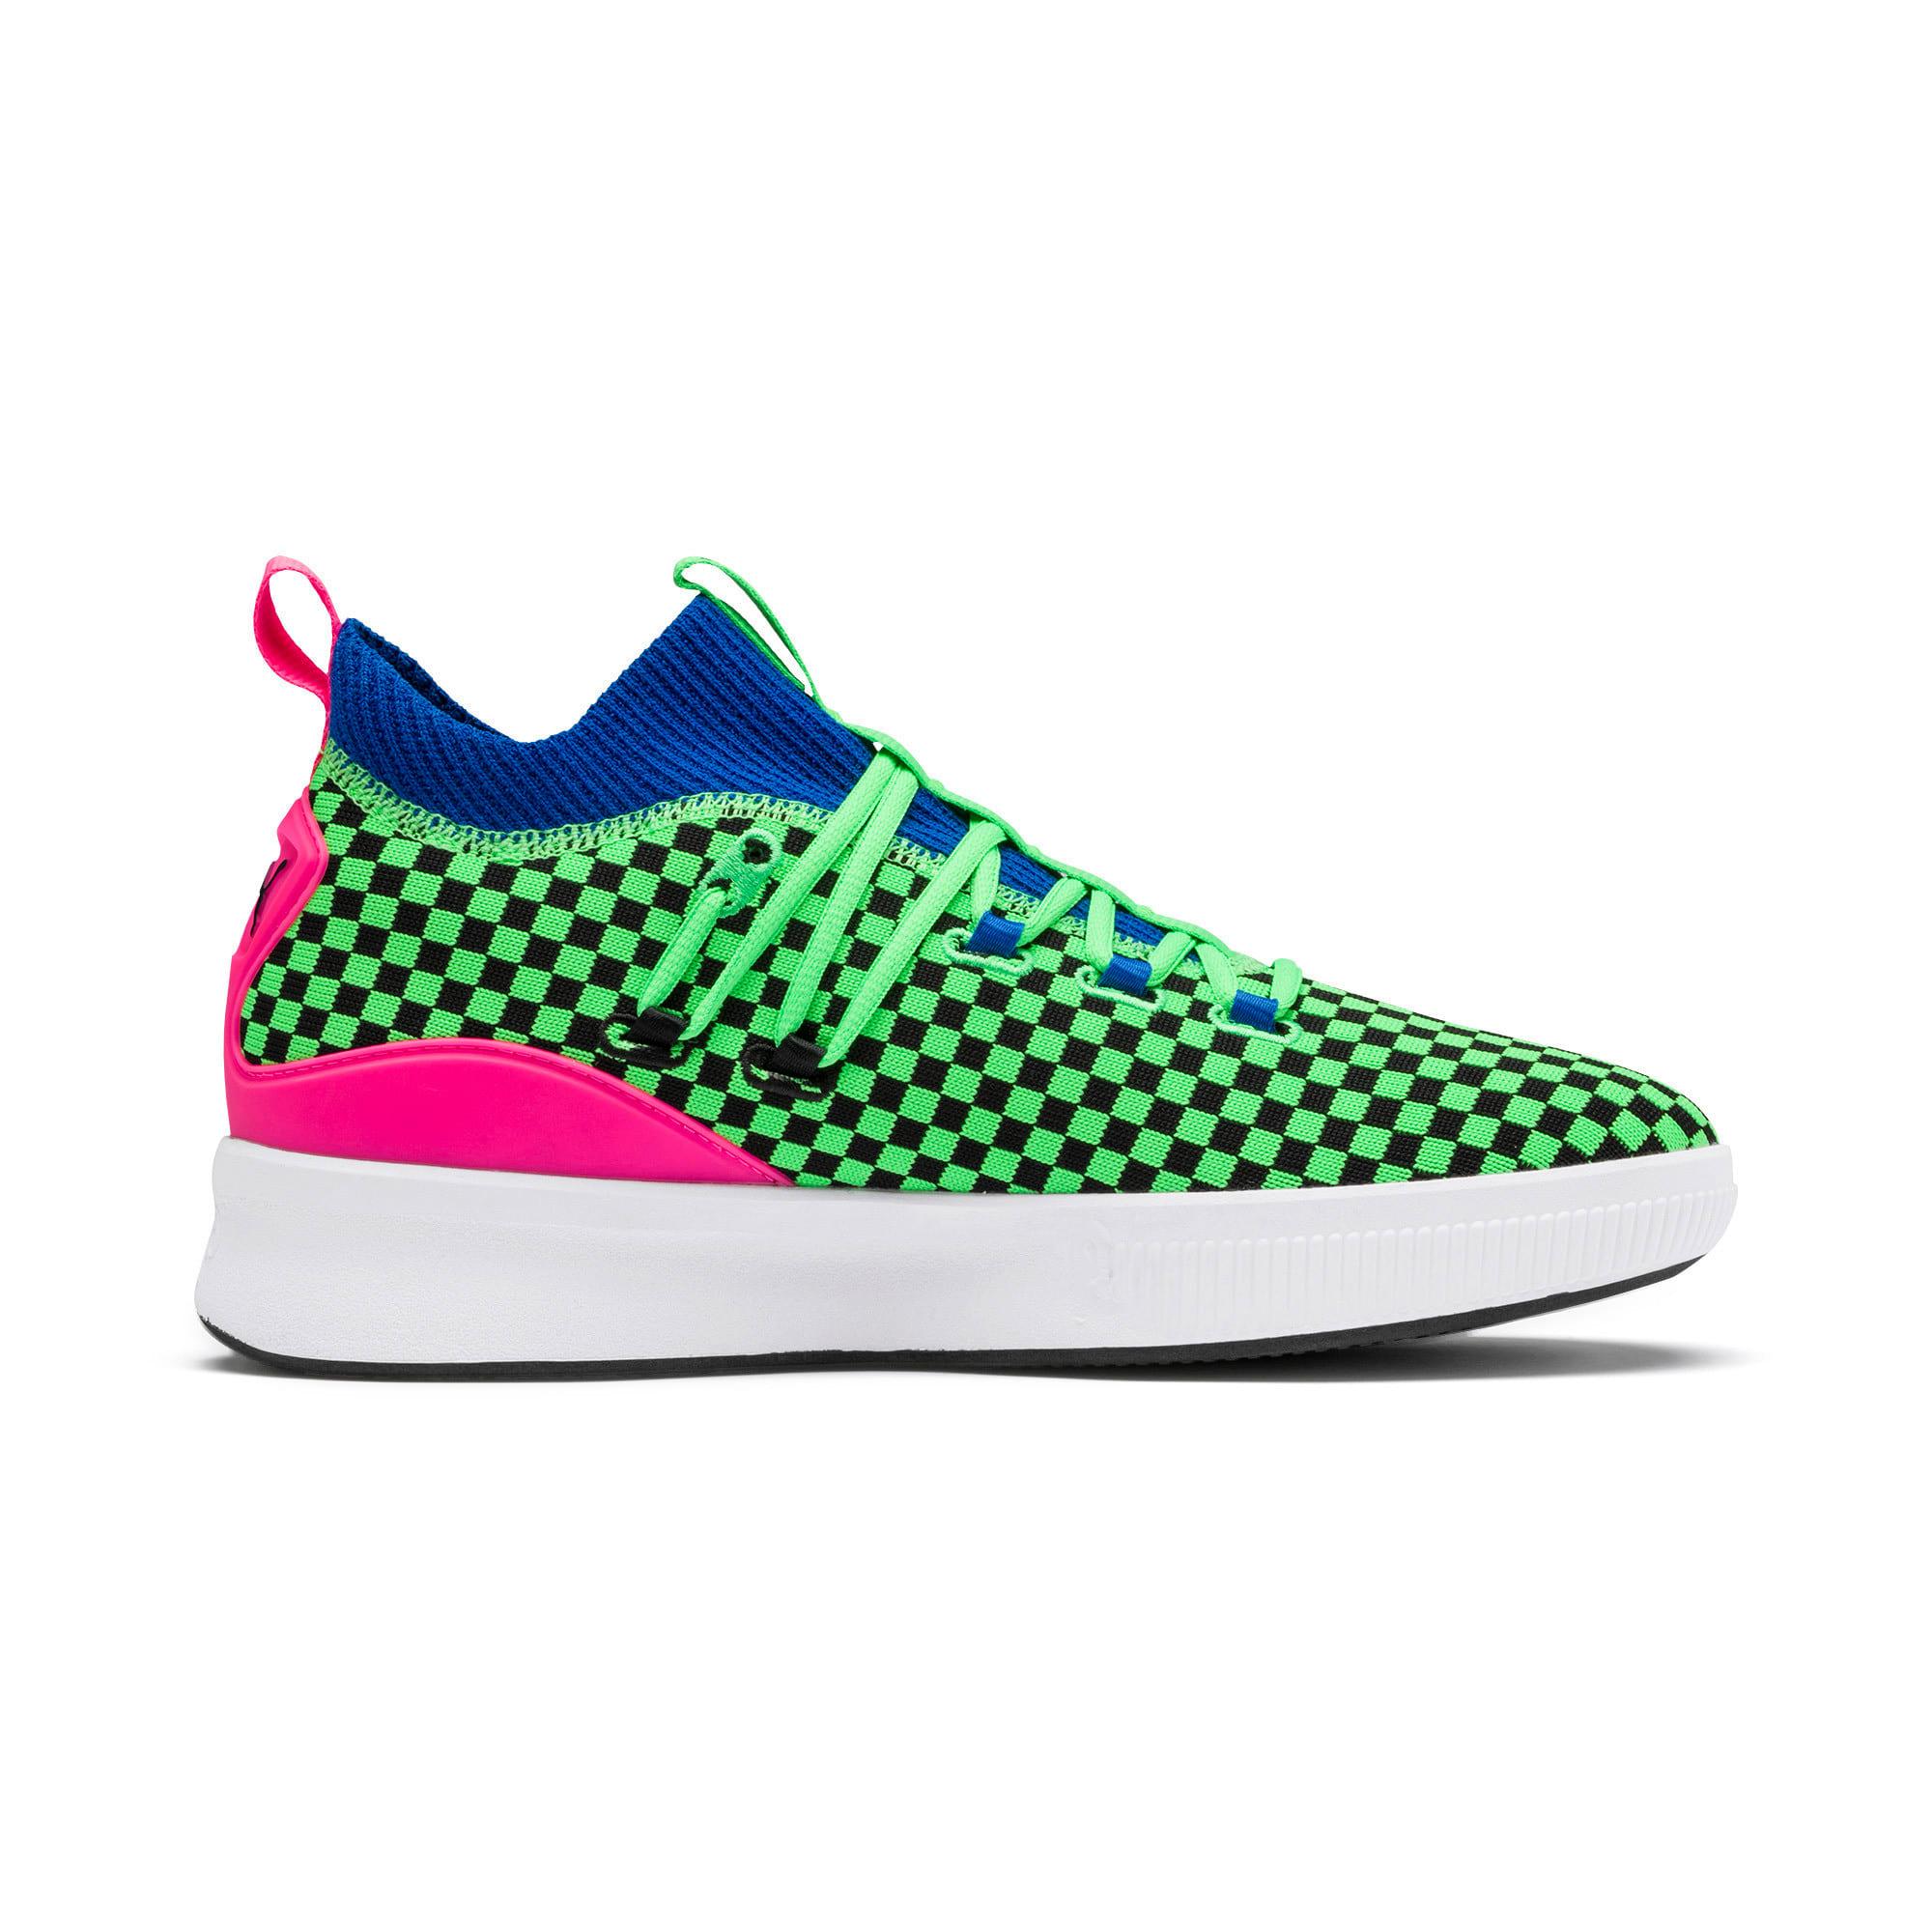 Thumbnail 5 of Clyde Court Summertime Basketball Shoes, 802 C Fluro Green PES, medium